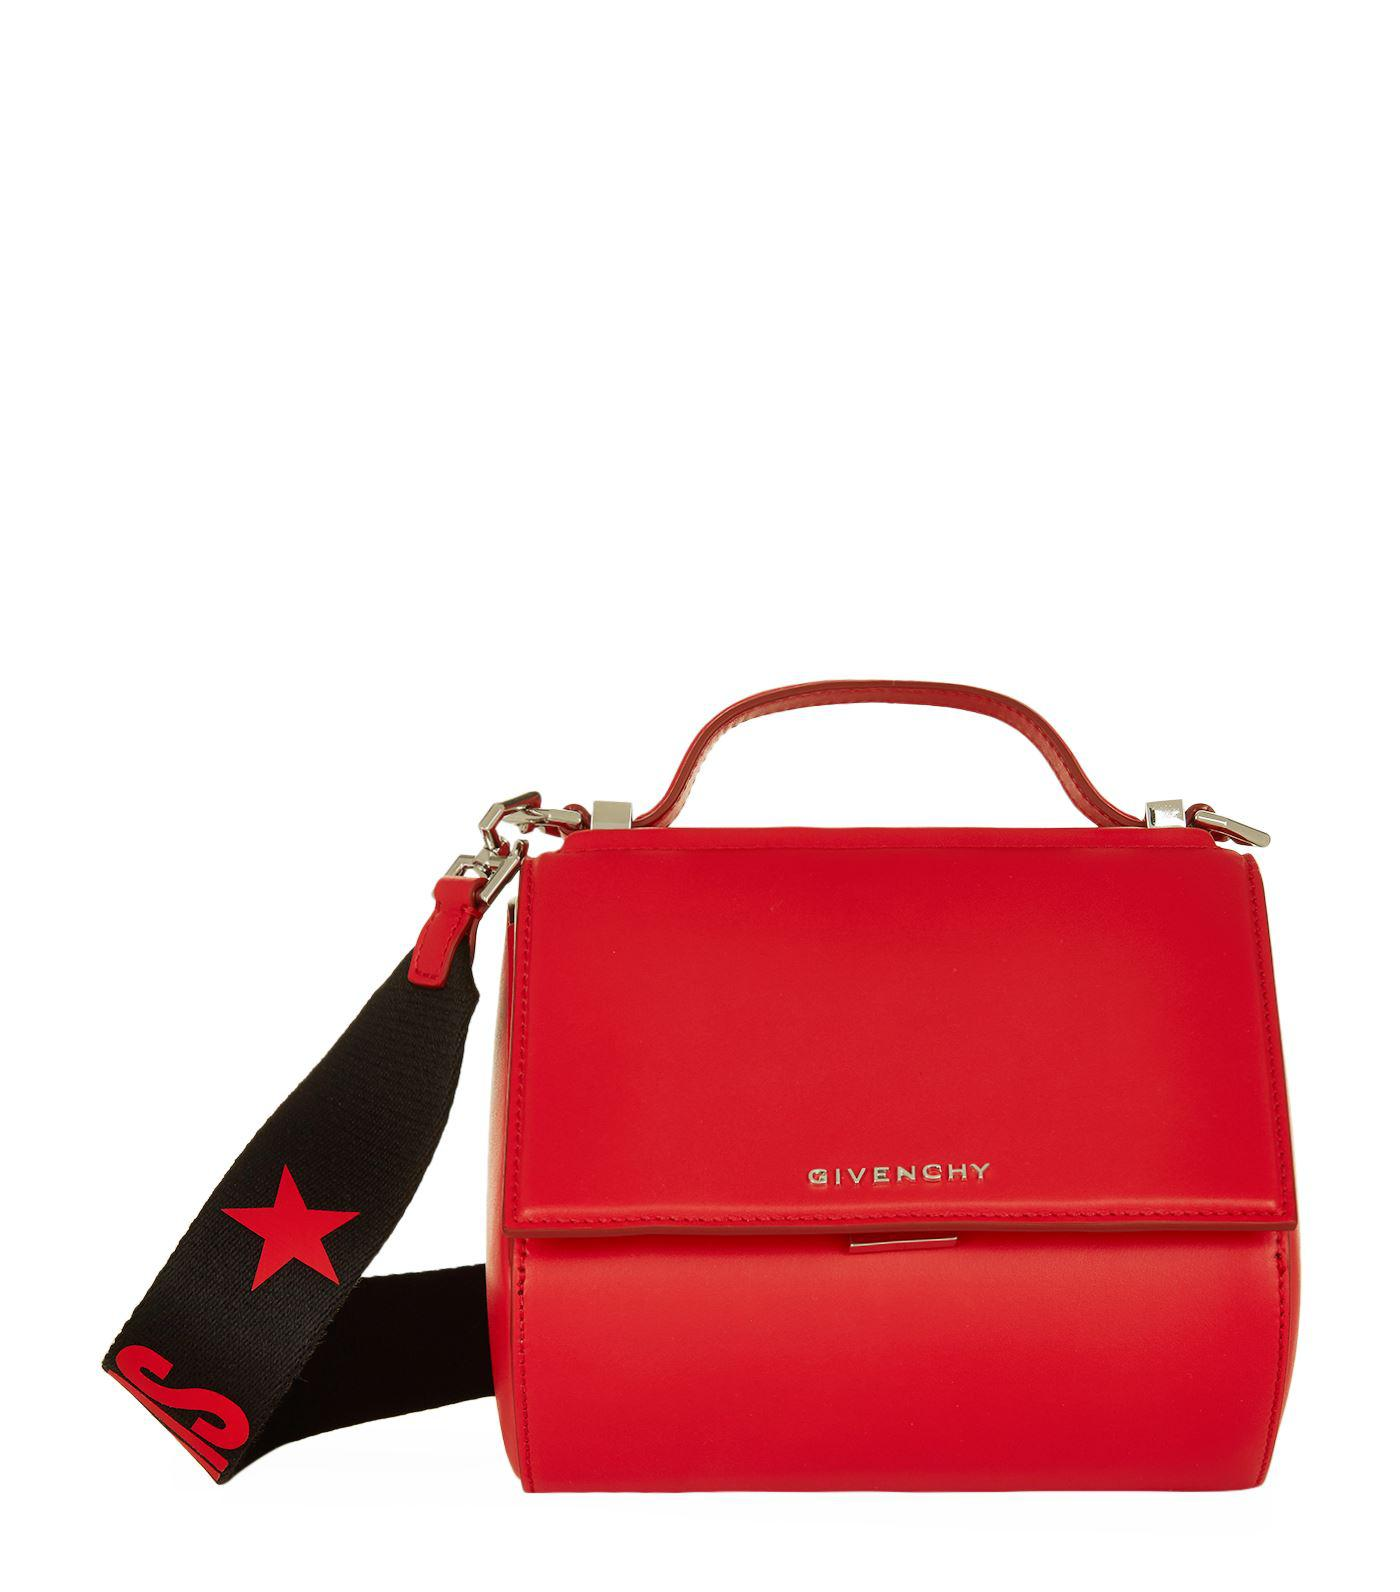 9dfeae32d89 Givenchy Mini Pandora Box Logo Strap Bag in Red - Lyst